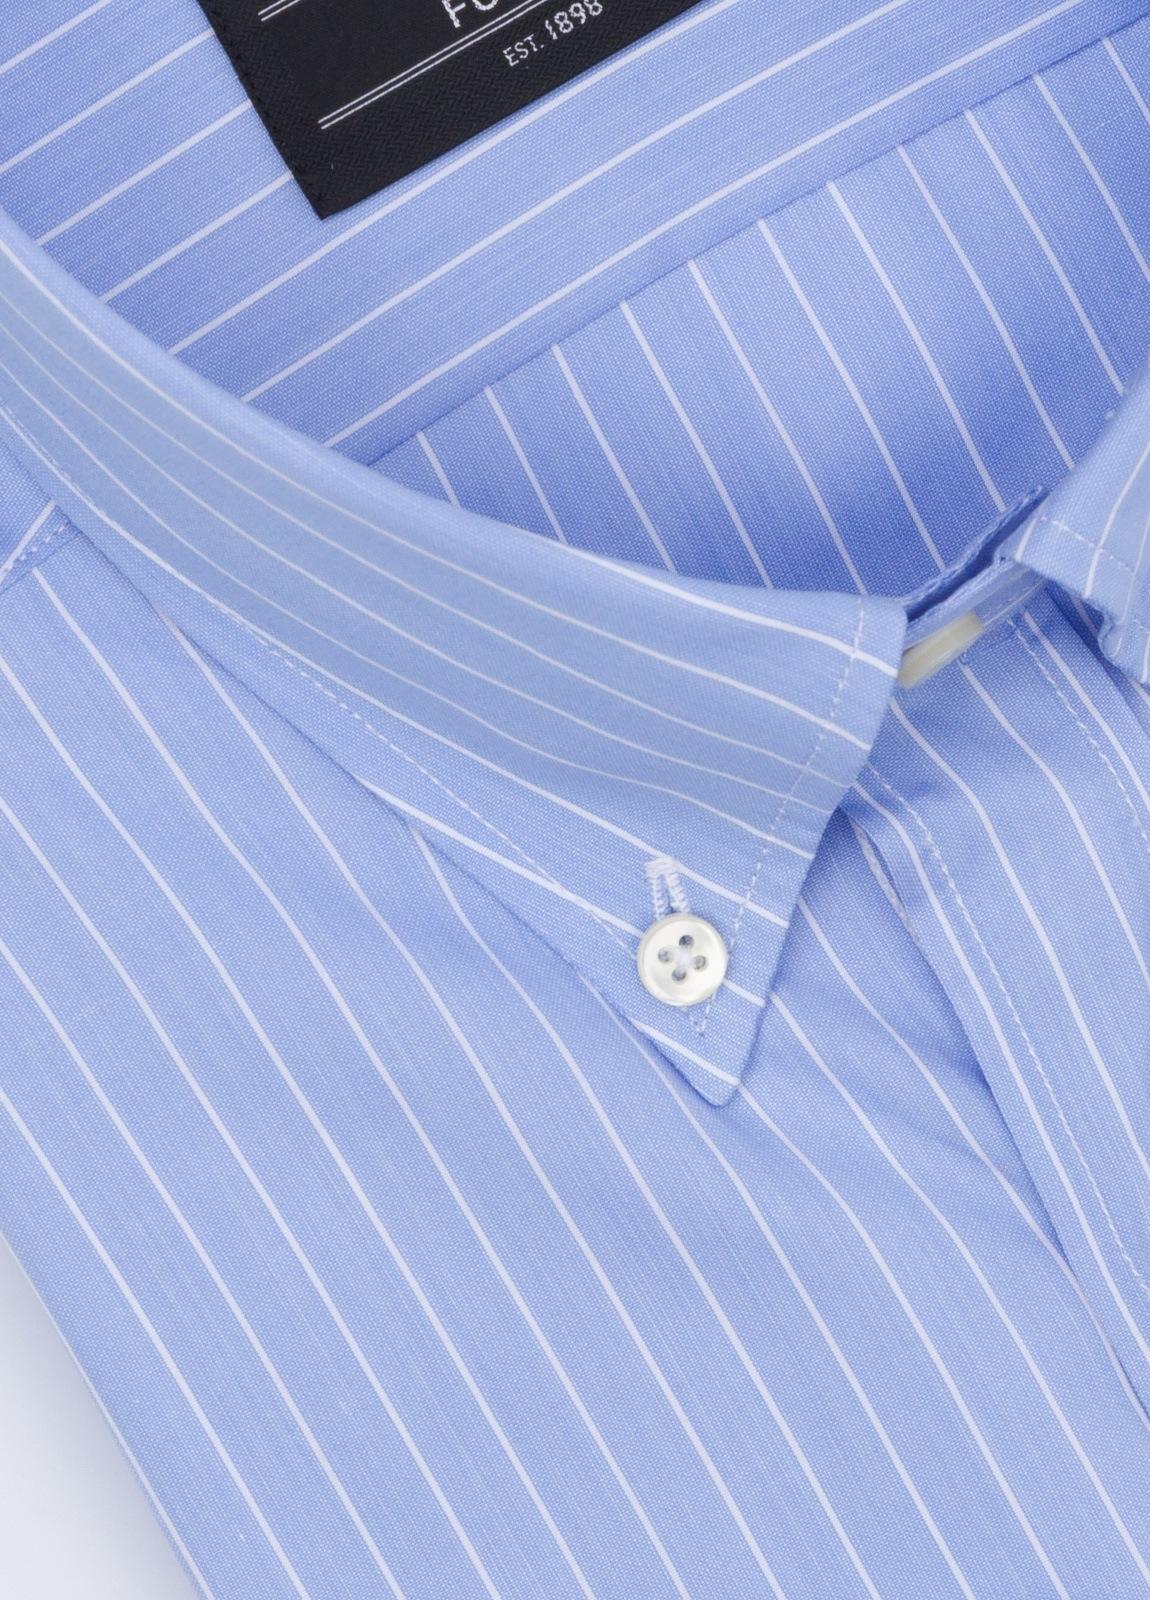 Camisa Formal Wear REGULAR FIT modelo BOTTON DOWN,con bosillo, color azul. 100% Algodón. - Ítem1